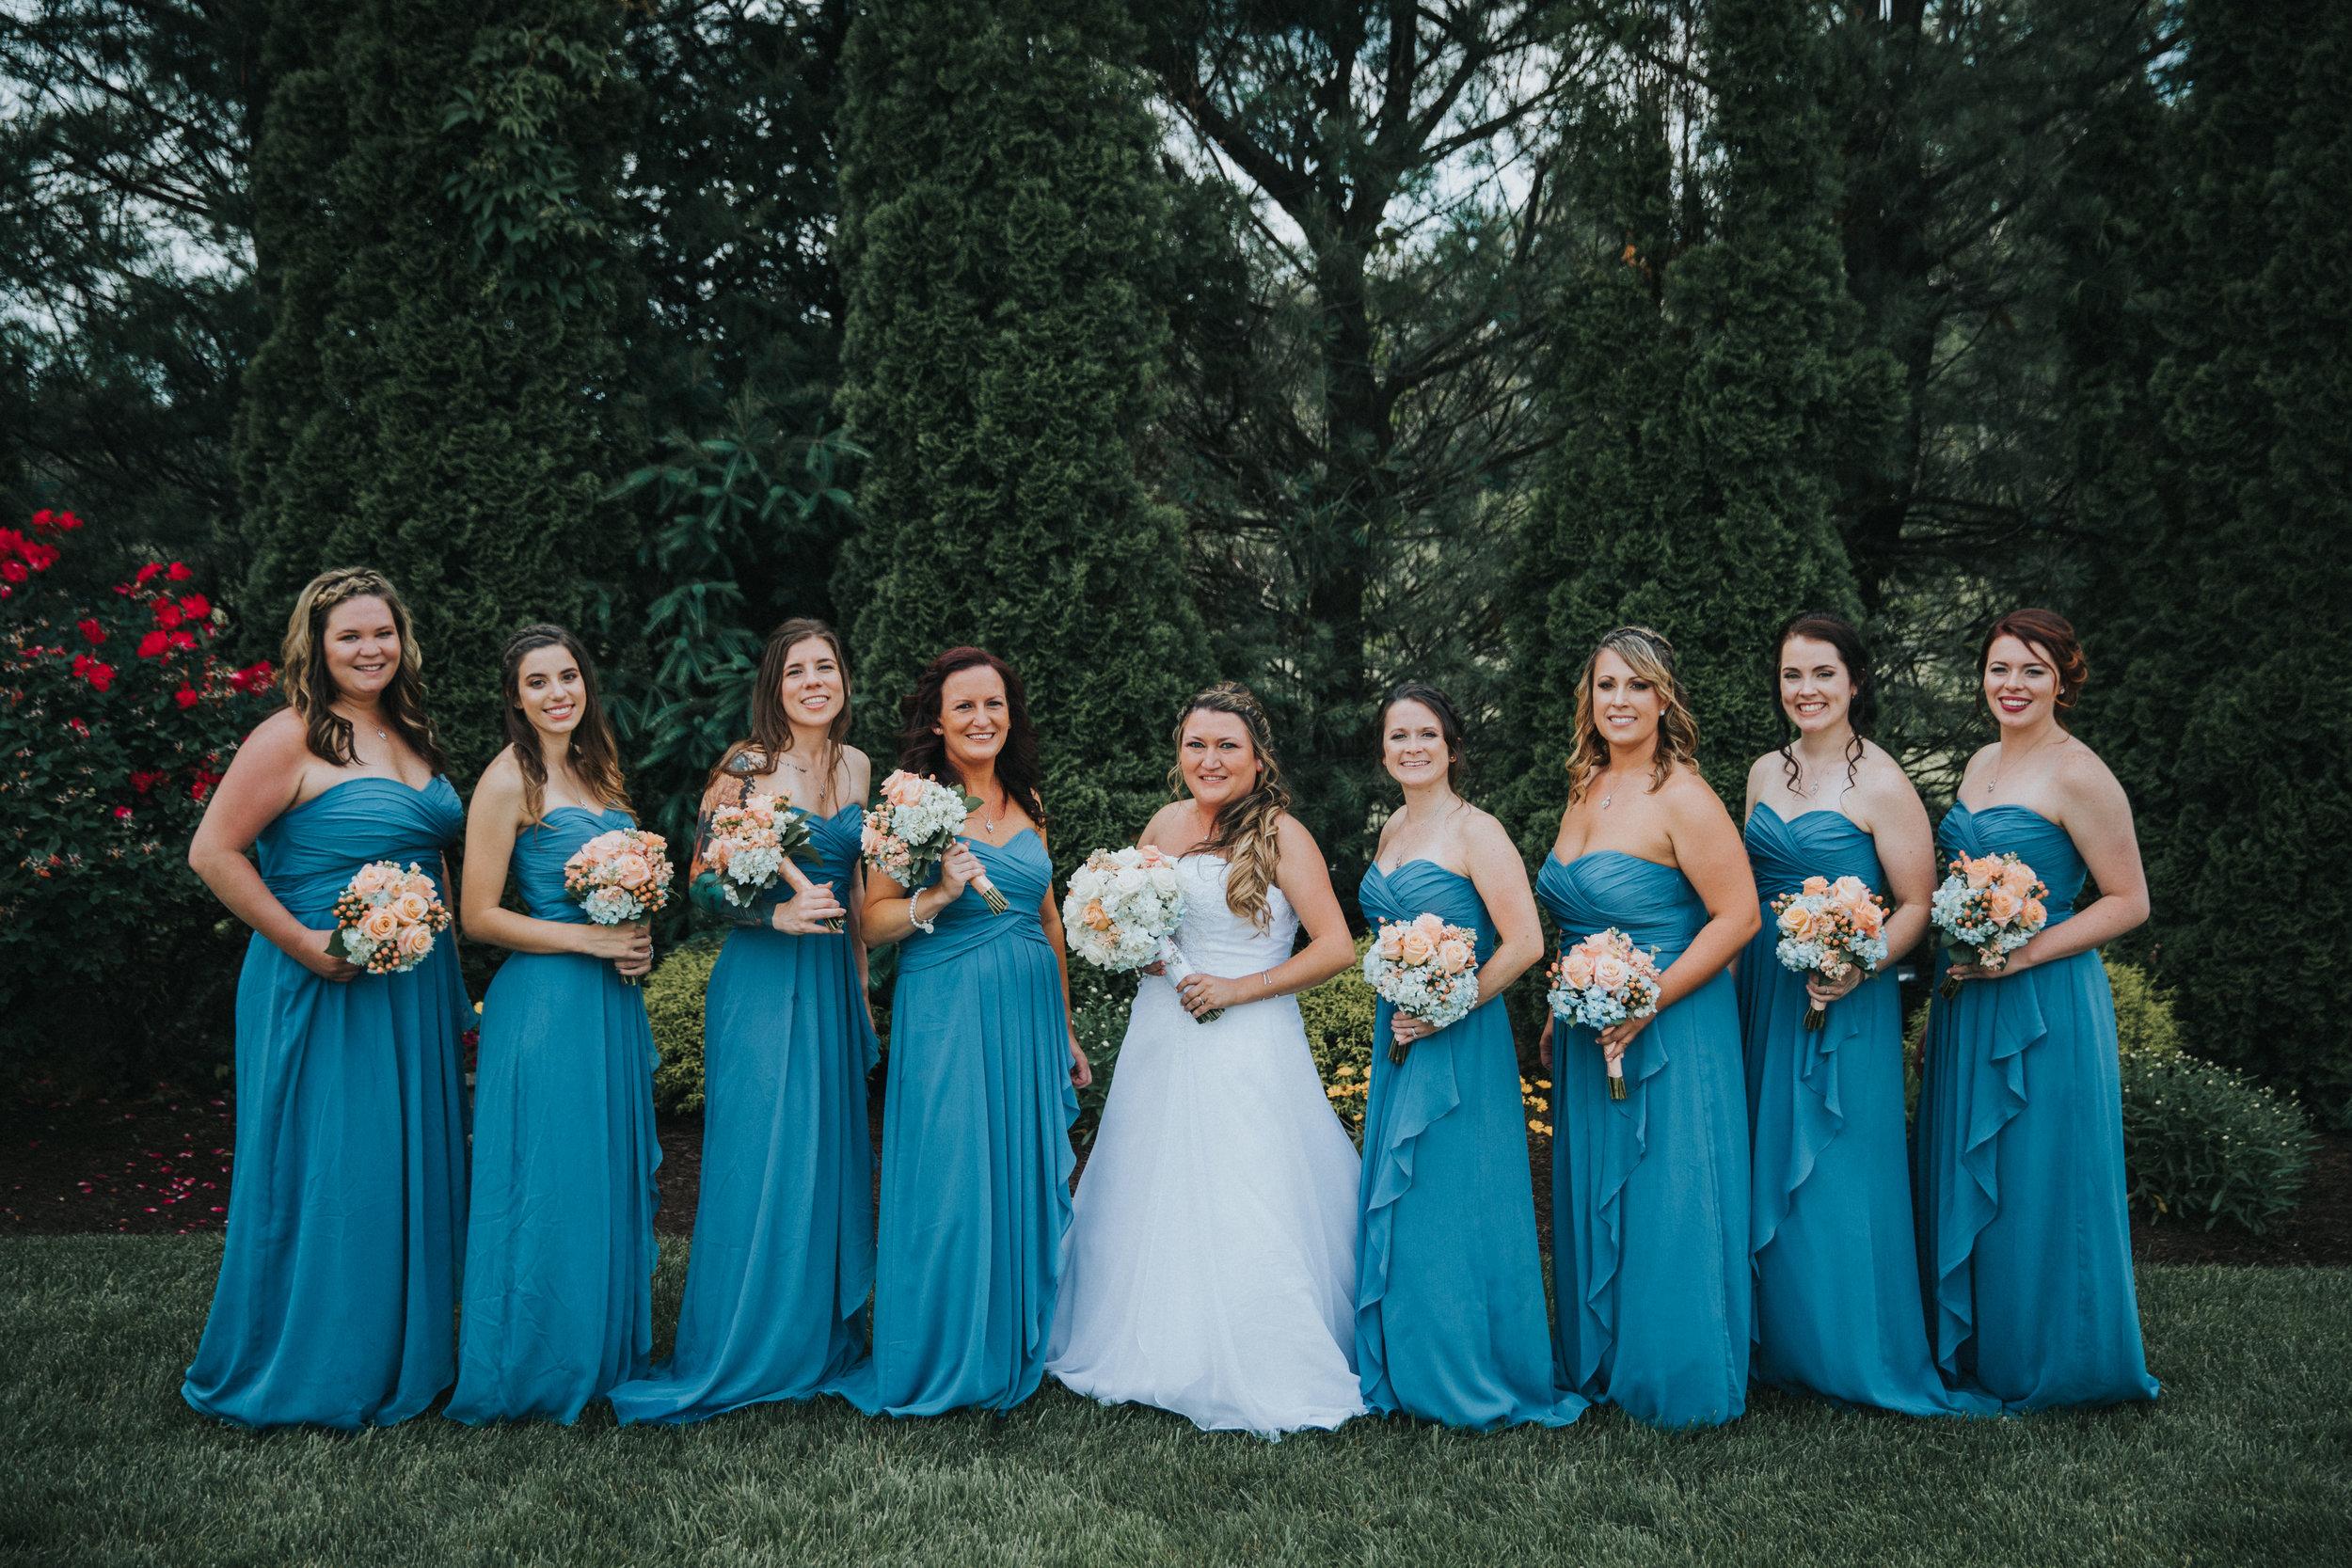 New-Jersey-Wedding-Photographer-JennaLynnPhotography-ValenzanoWinery-BridalParty-41.jpg